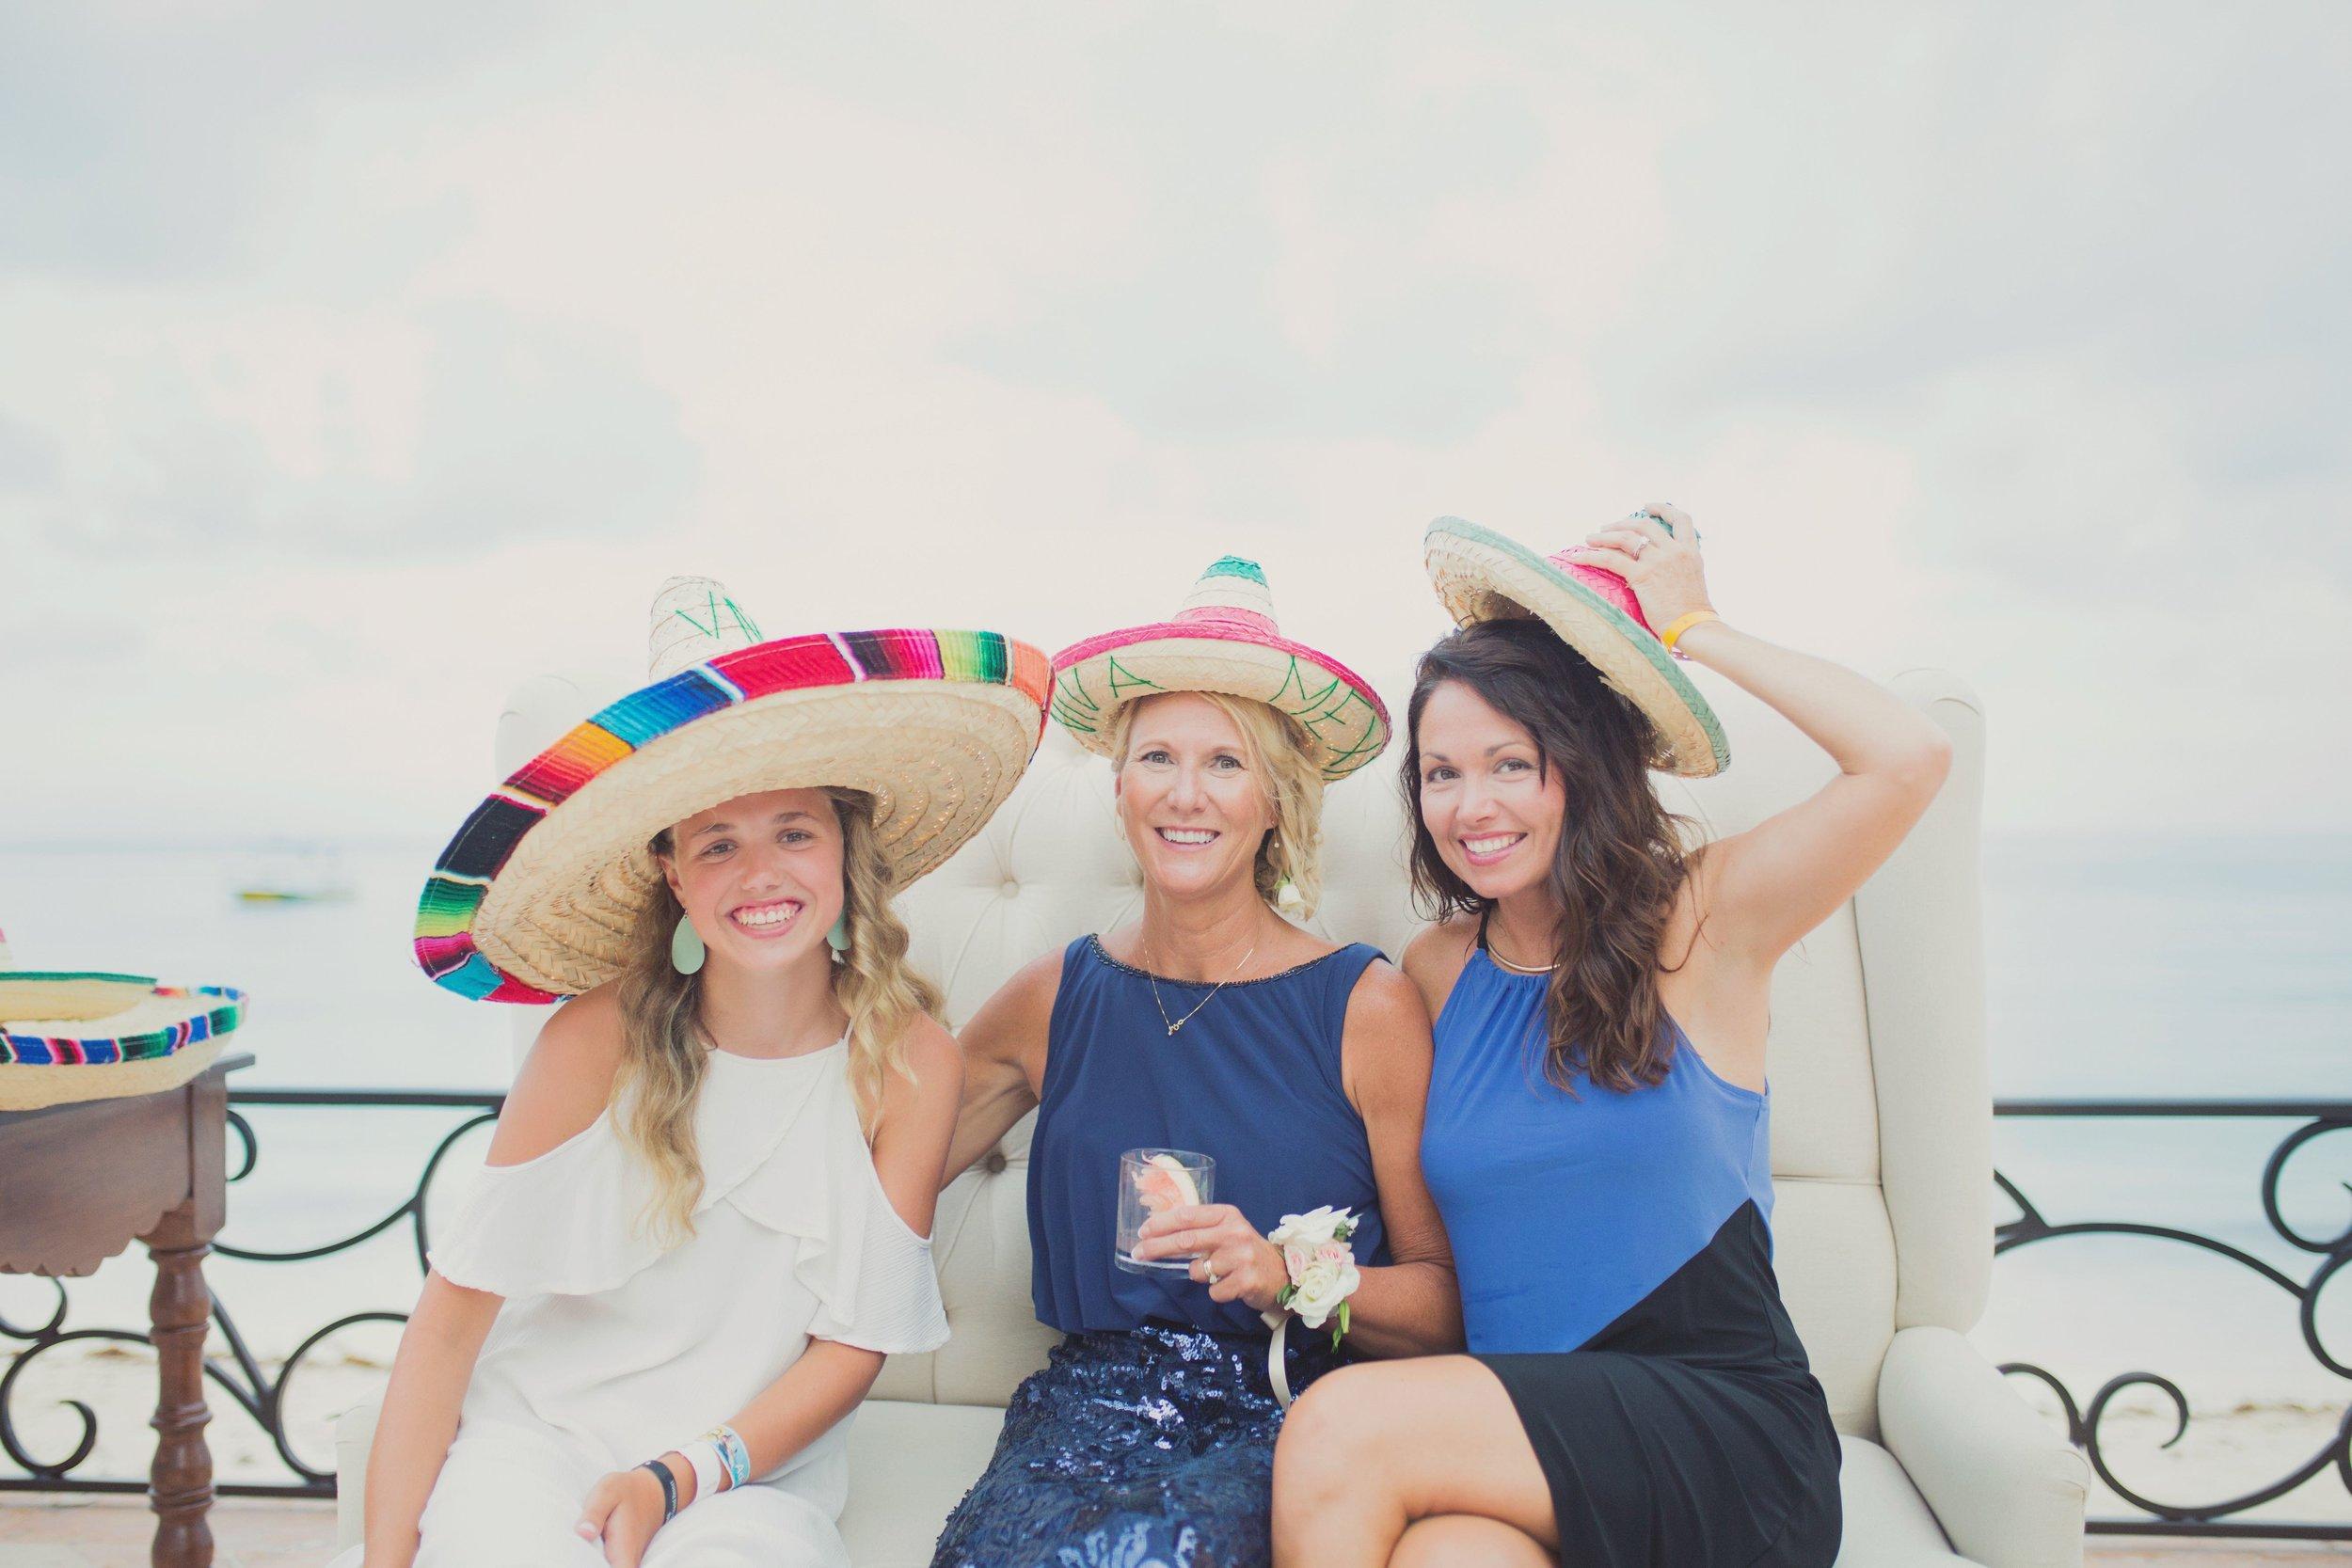 cancun-wedding-venue-villa-la-joya-953 copy-websize.jpg